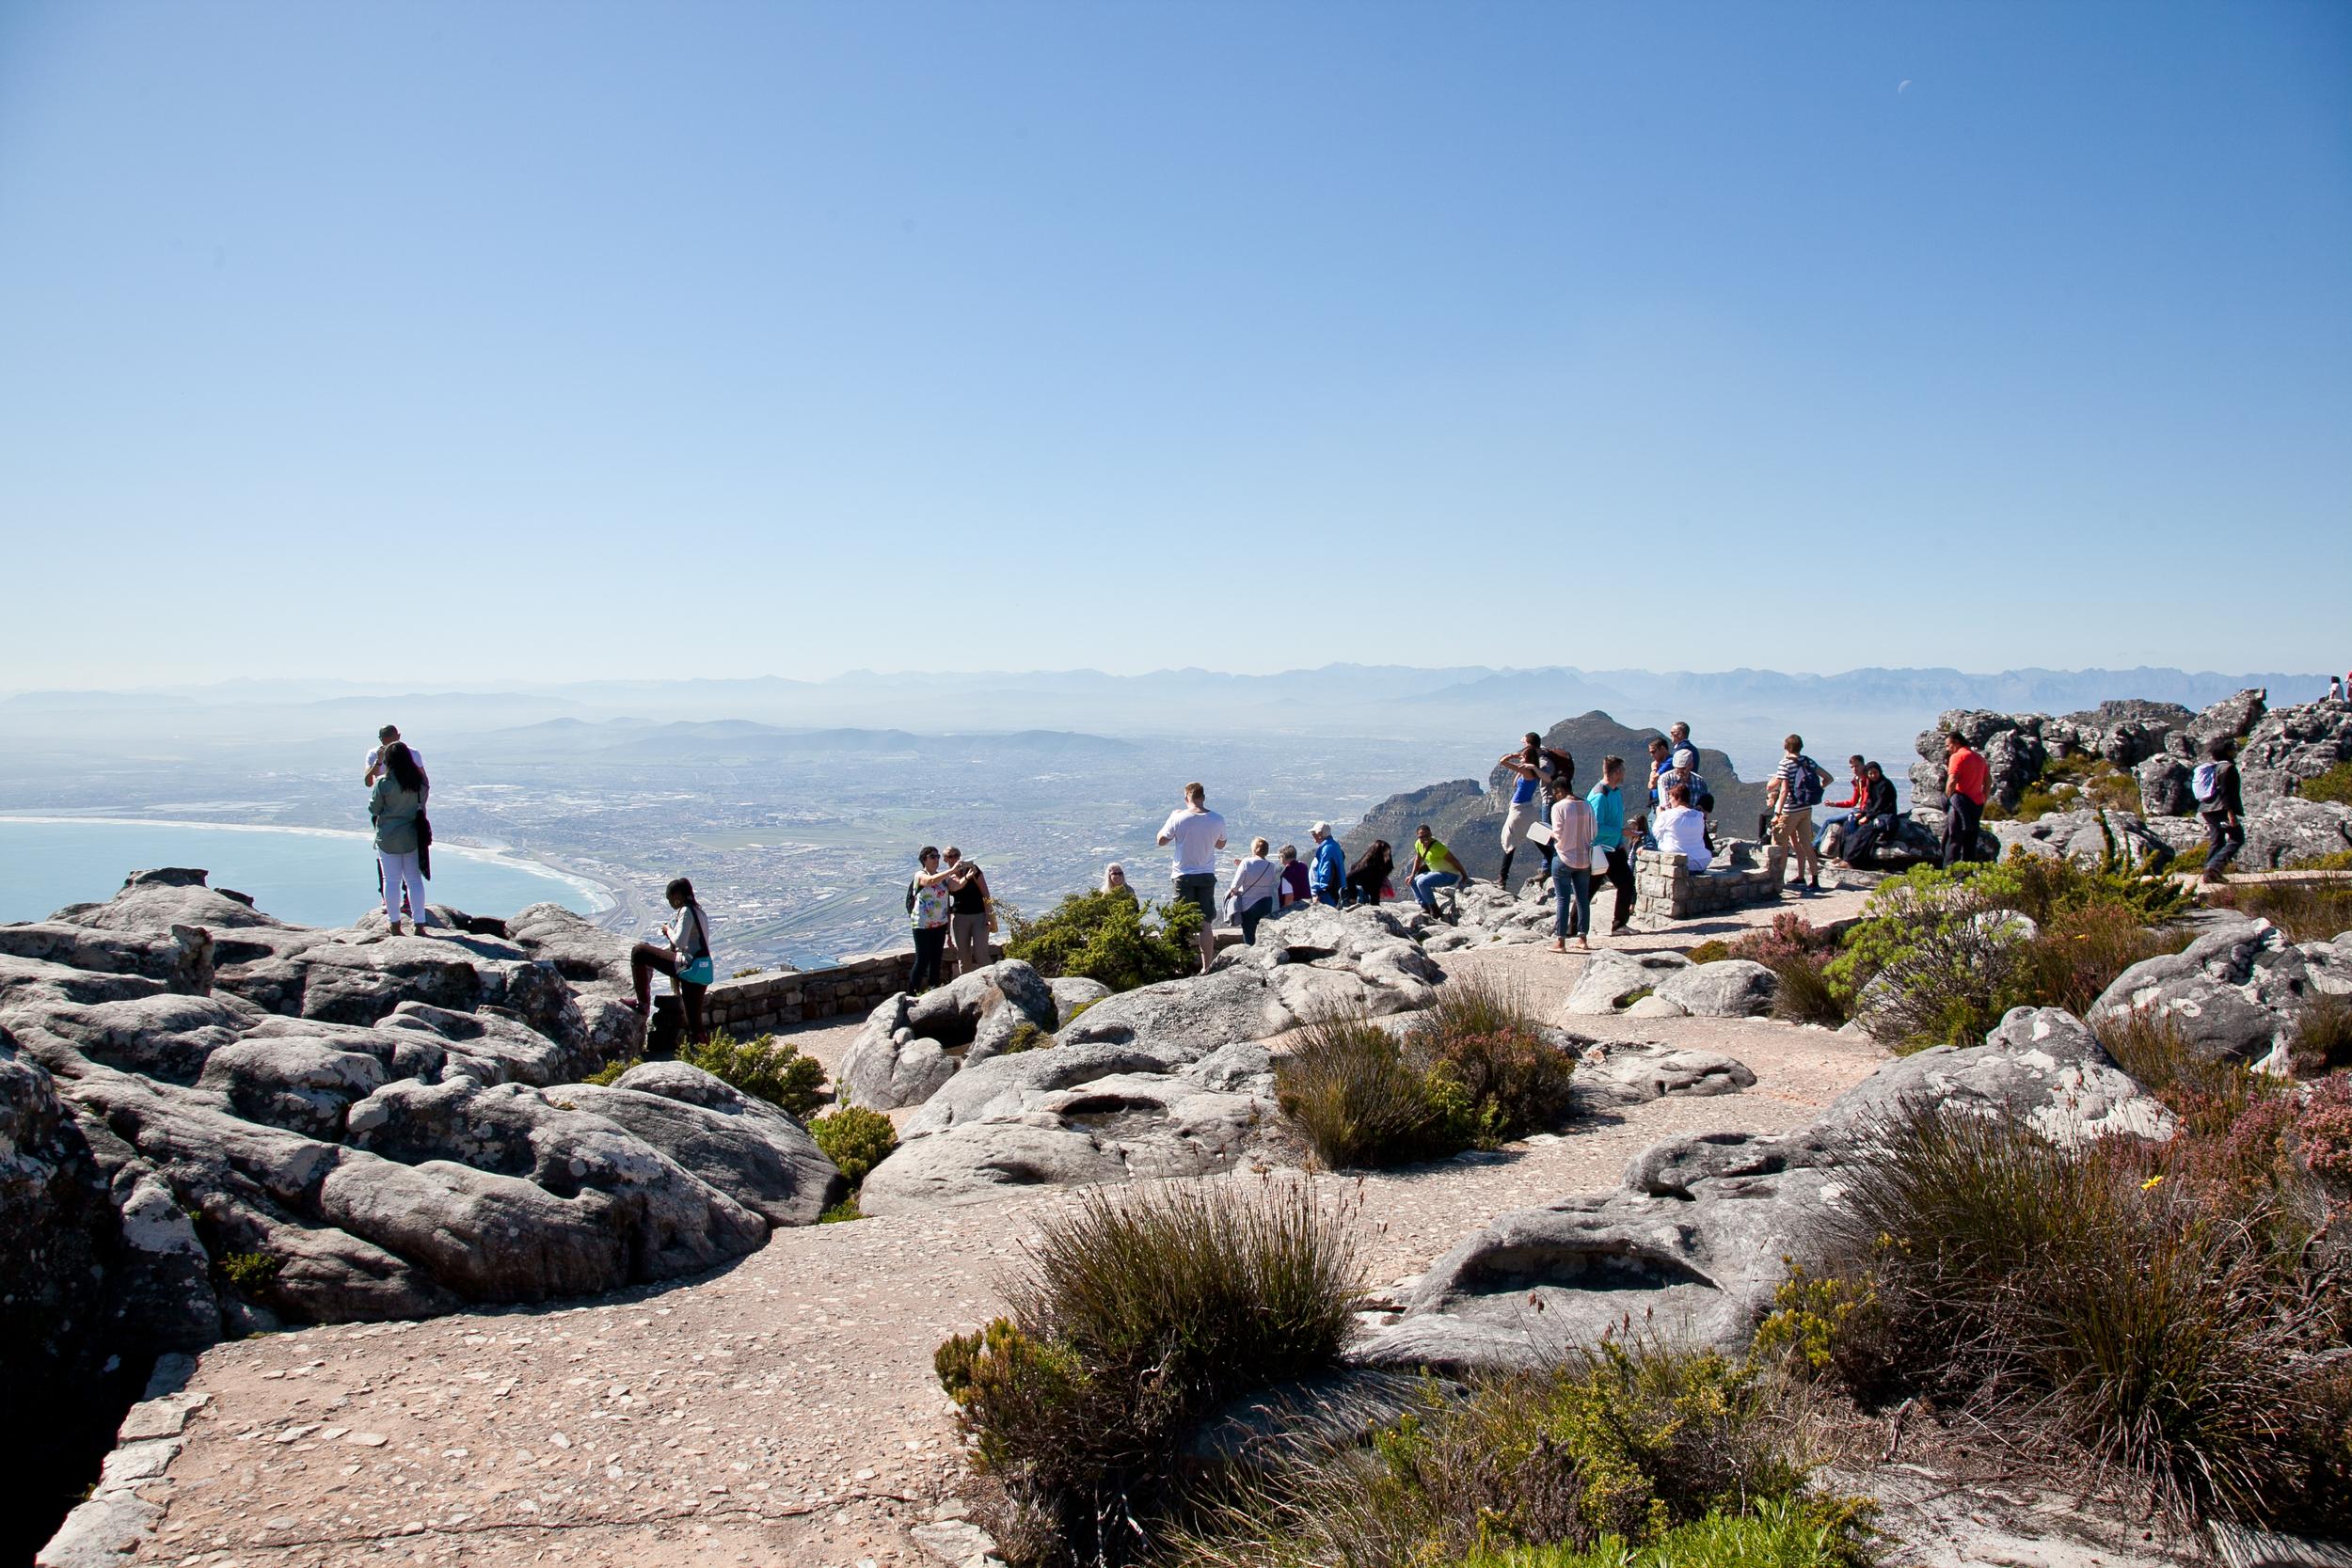 IMG_4688-table-mountain-cape-town-south-africa-trisa-taro.jpg